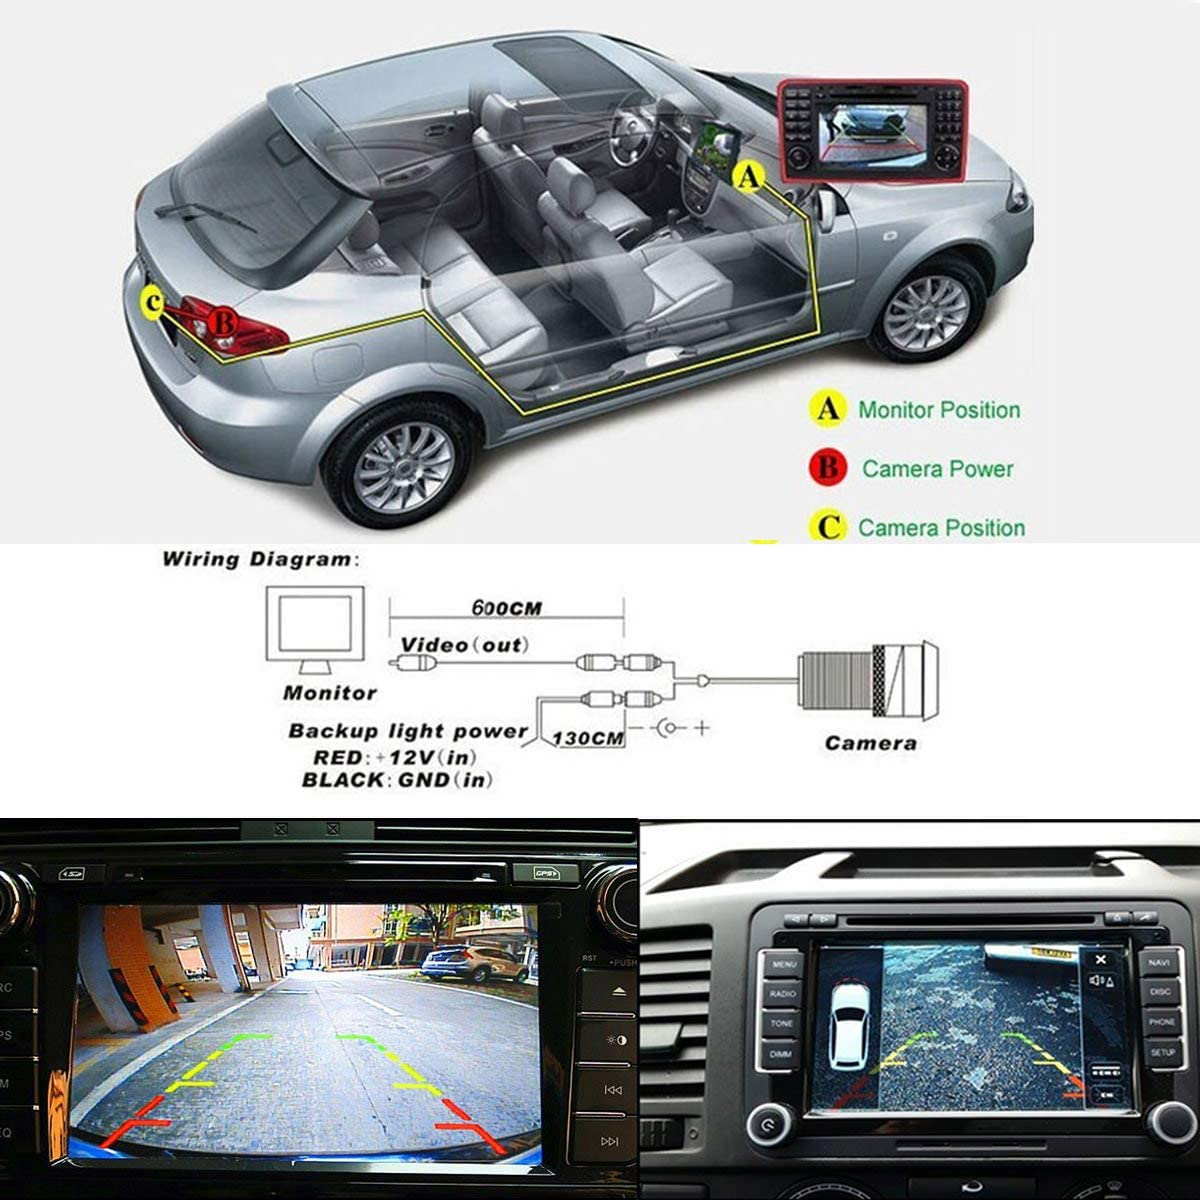 Super HD CCD Sensor Vehicle 20mm 170 Wide Angle Night Vision Rear View IP68 Reverse Backup Camera for Mercedes Benz Vito//Viano//Sprinter RV-MV//Van